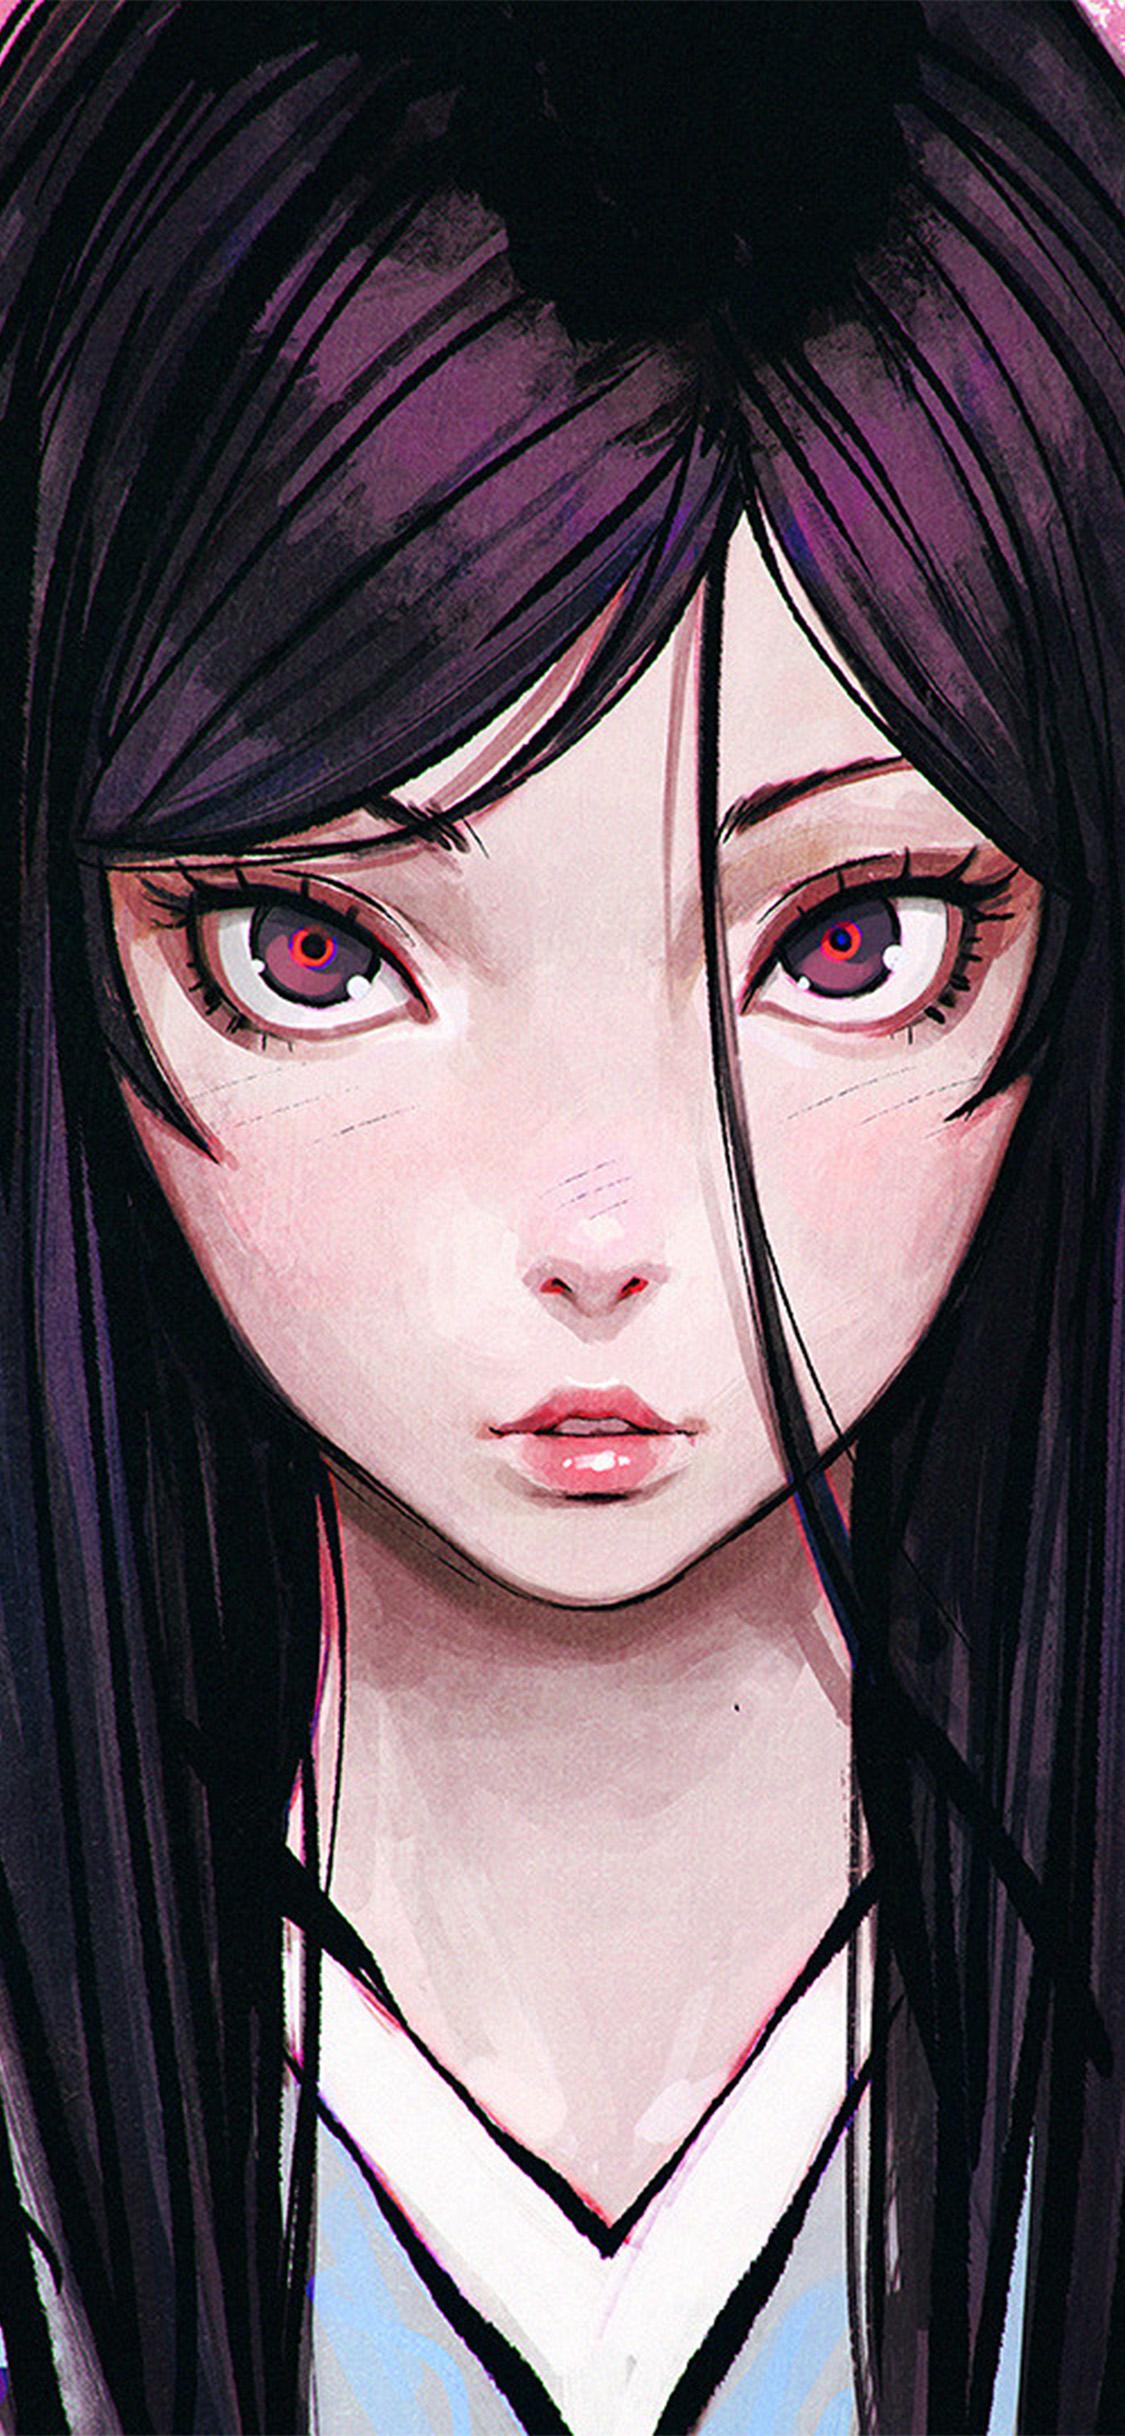 iPhonexpapers.com-Apple-iPhone-wallpaper-bf33-eye-girl-anime-illustration-eye-drawing-art